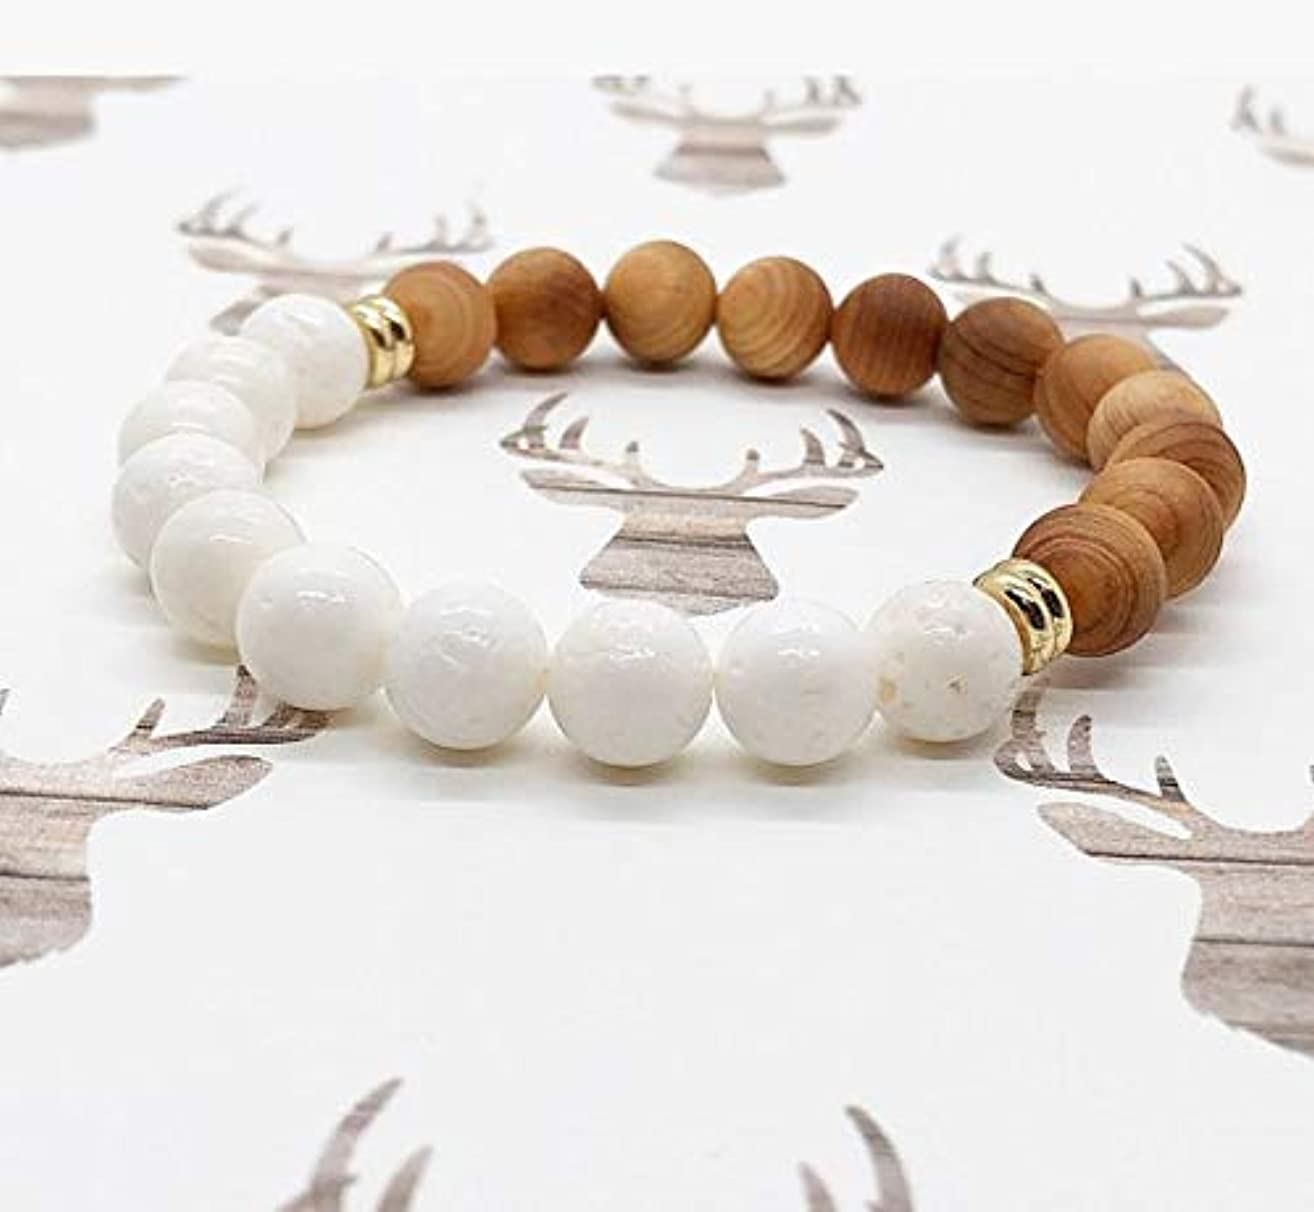 Thuja Wood & Sponge Coral Diffuser Bracelet, Wood Diffuser, Natural Diffuser Bracelet, Coral Bracelet, White Lava Rocks, Yoga Accessories, Aromatherapy, Oil Bracelet, Oil Diffuser, Handmade